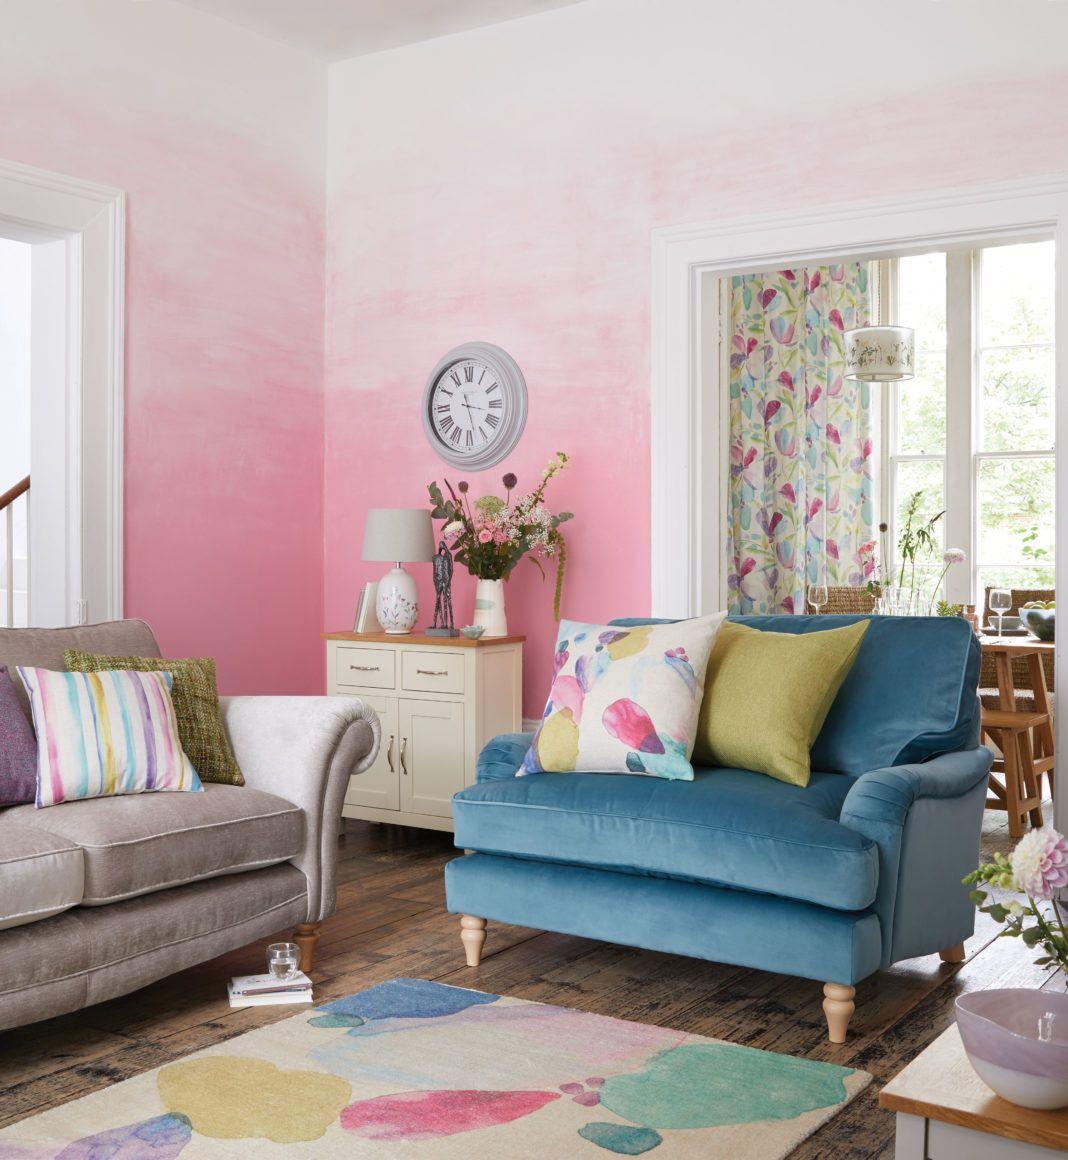 Dunelm Ss18 Trends Impressionist Living Room Remodel Modern Rustic Living Room Living Room Modern Living room ideas dunelm